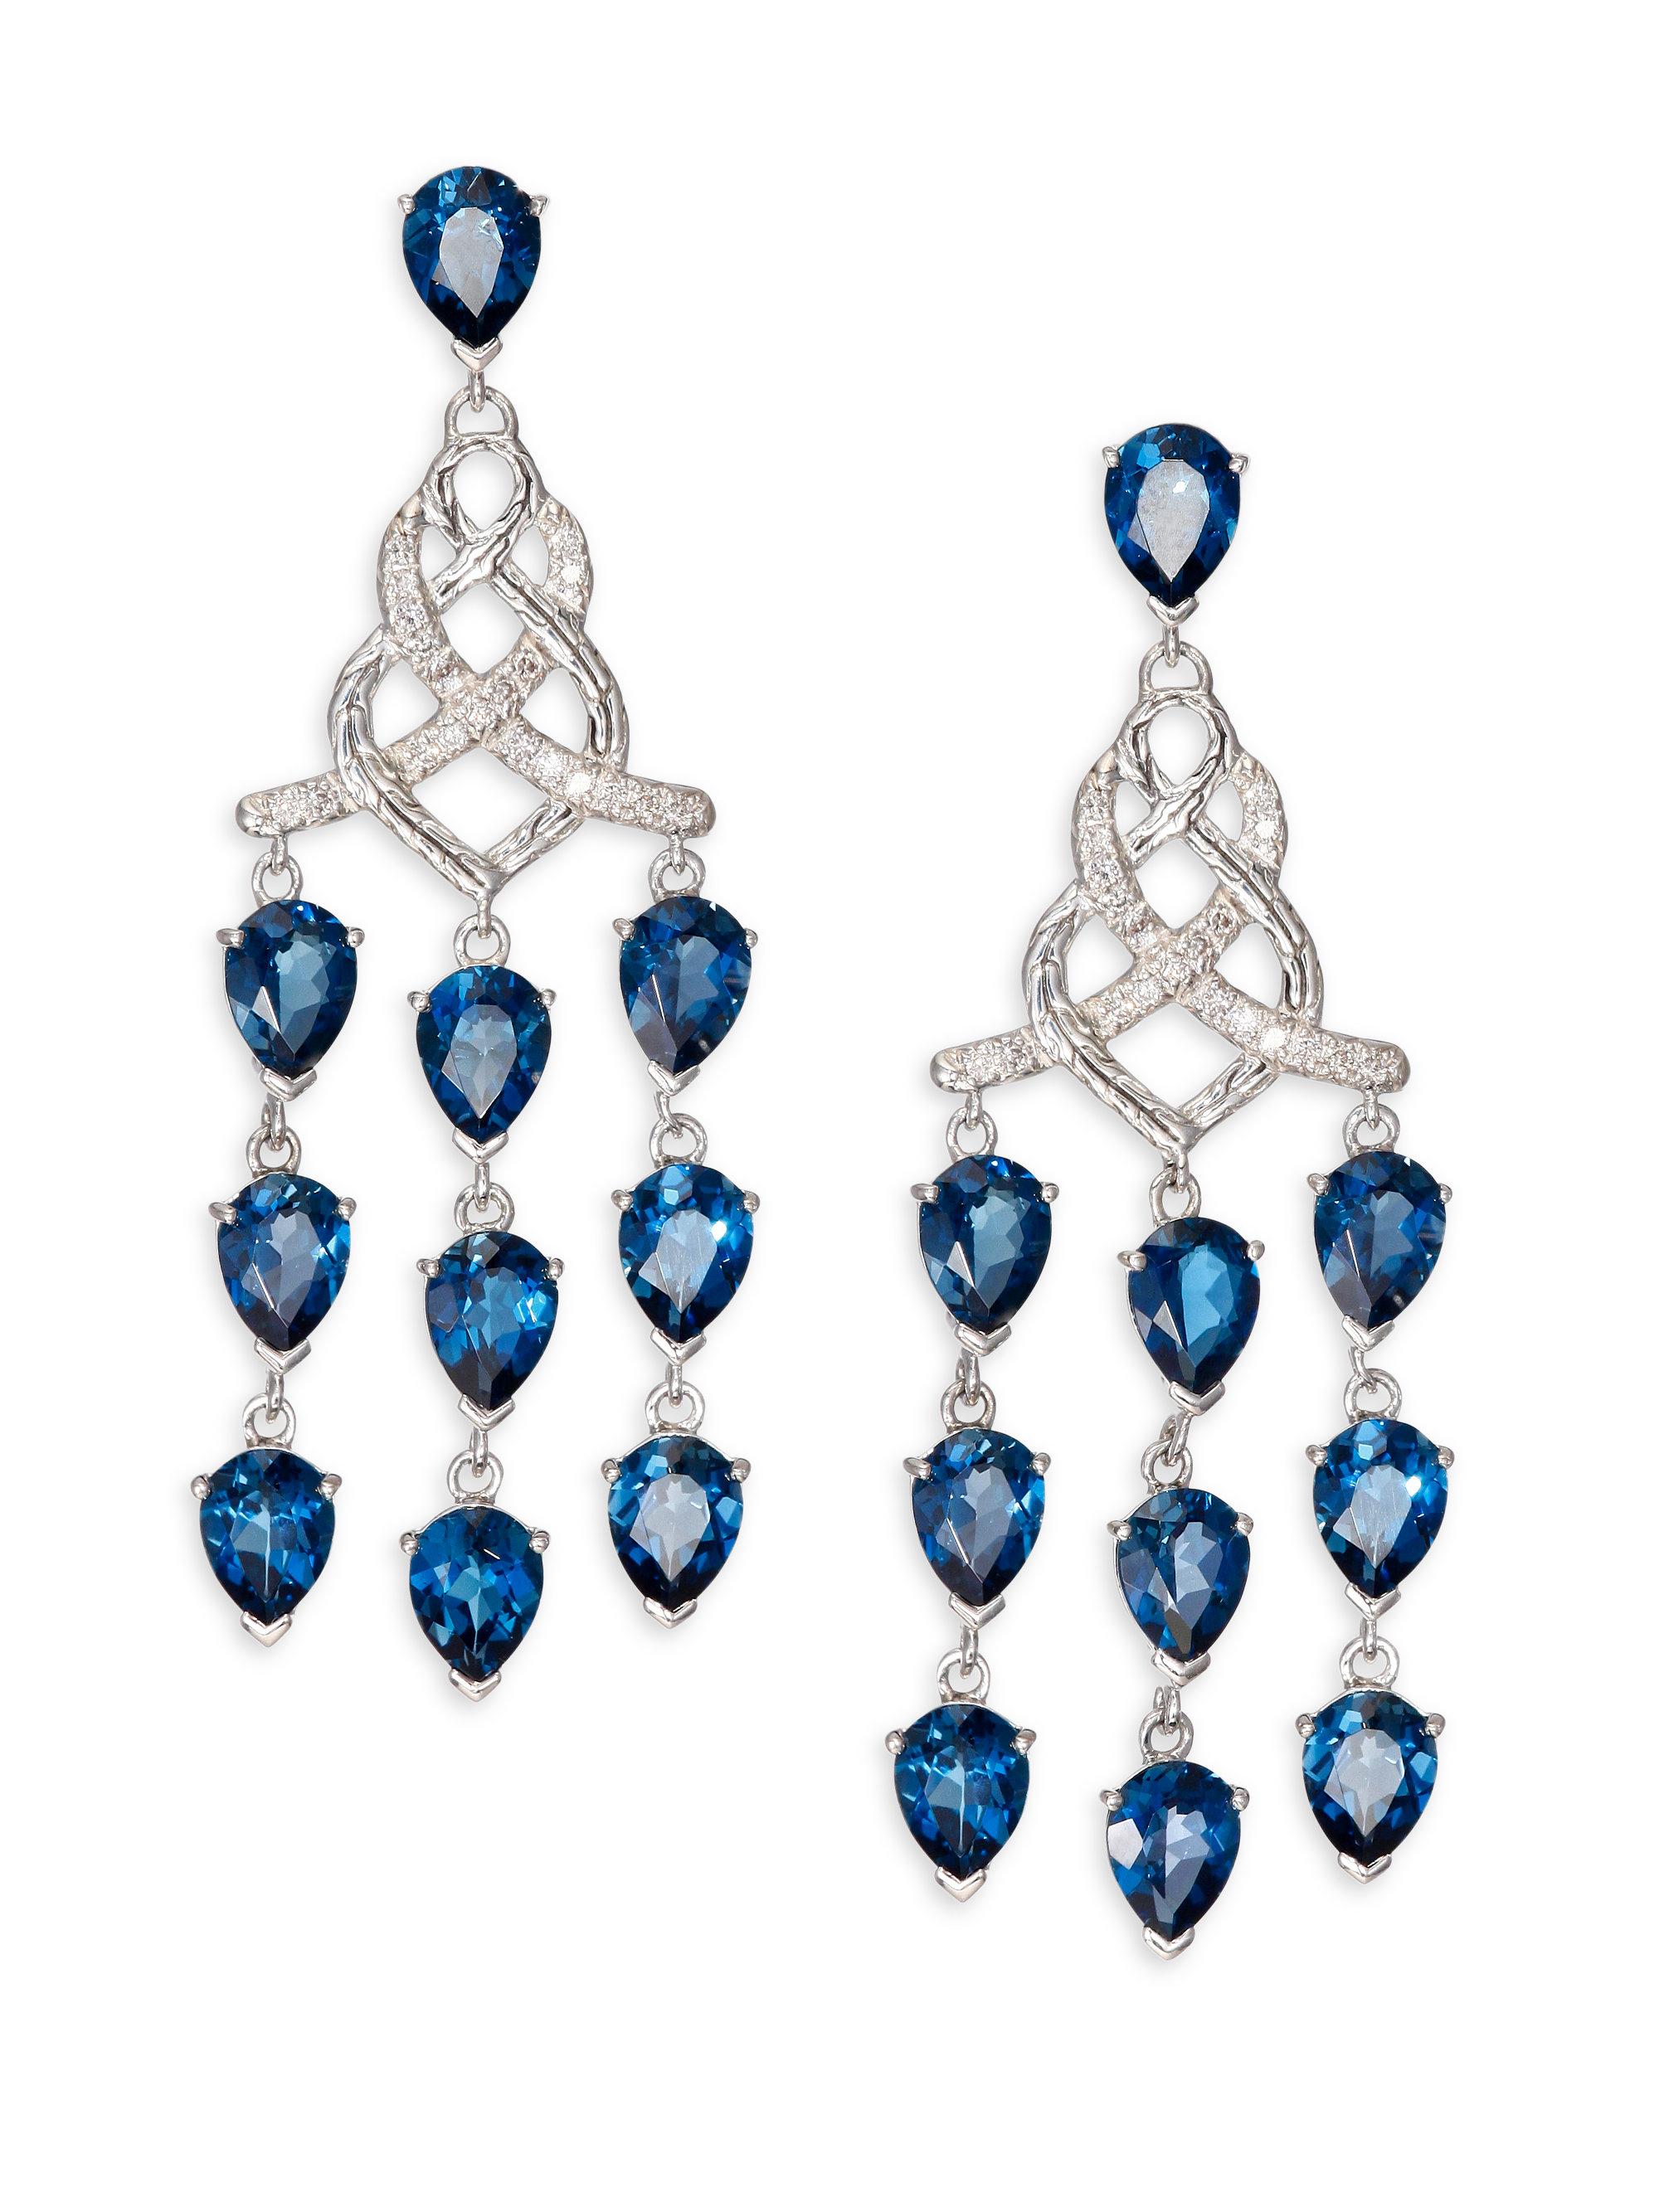 John hardy Classic Chain London Blue Topaz Diamond & Sterling